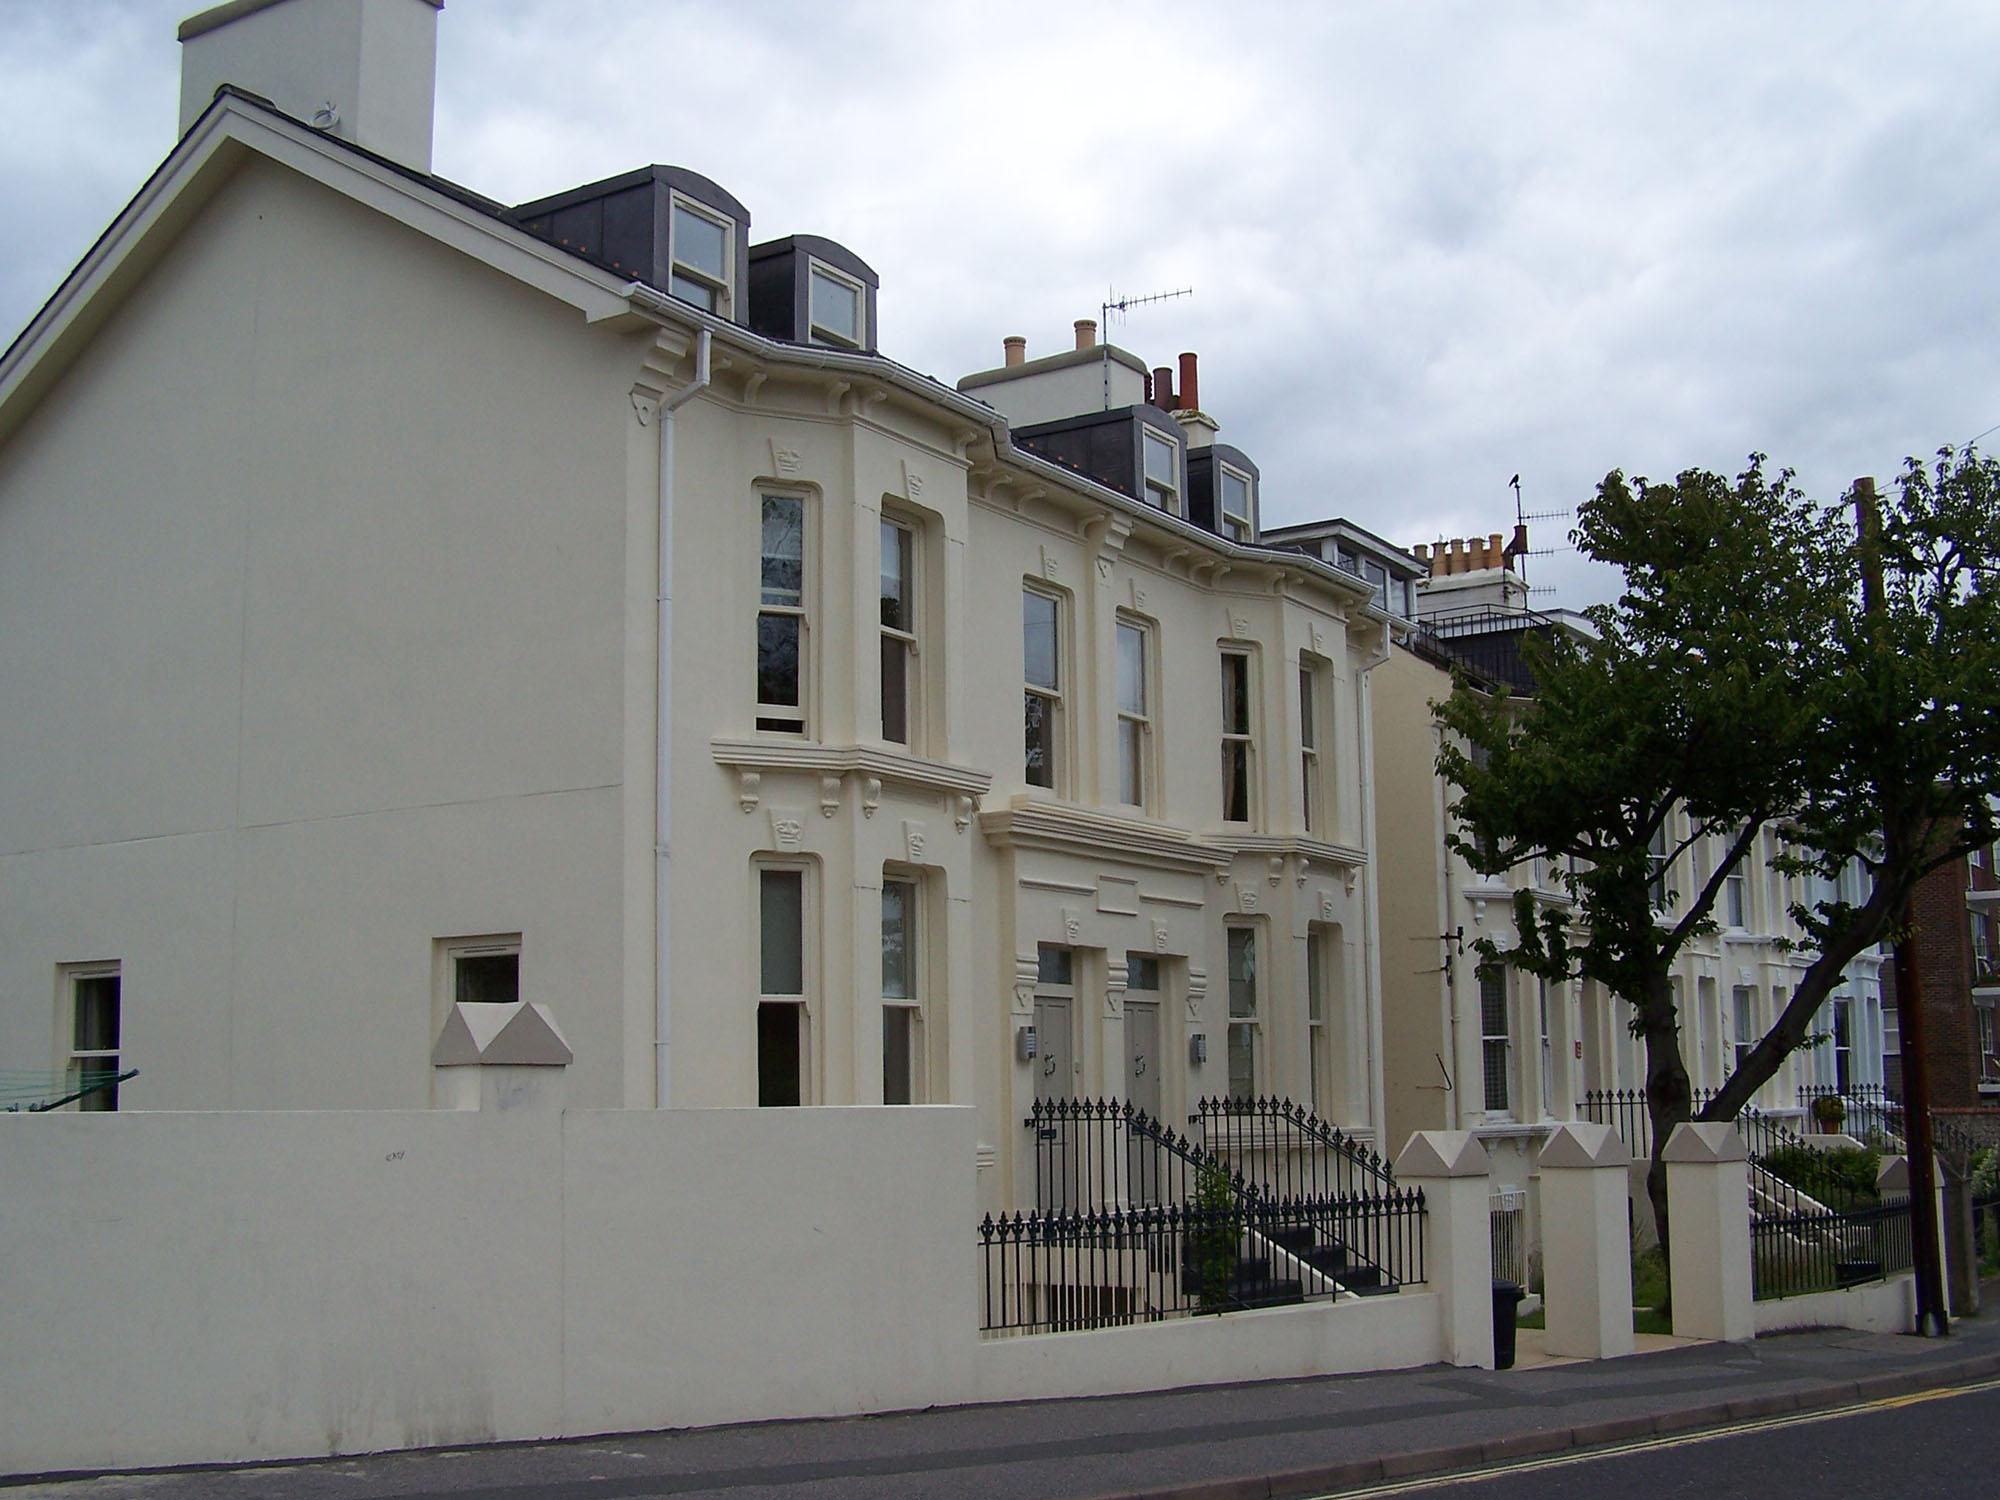 Priory Villas